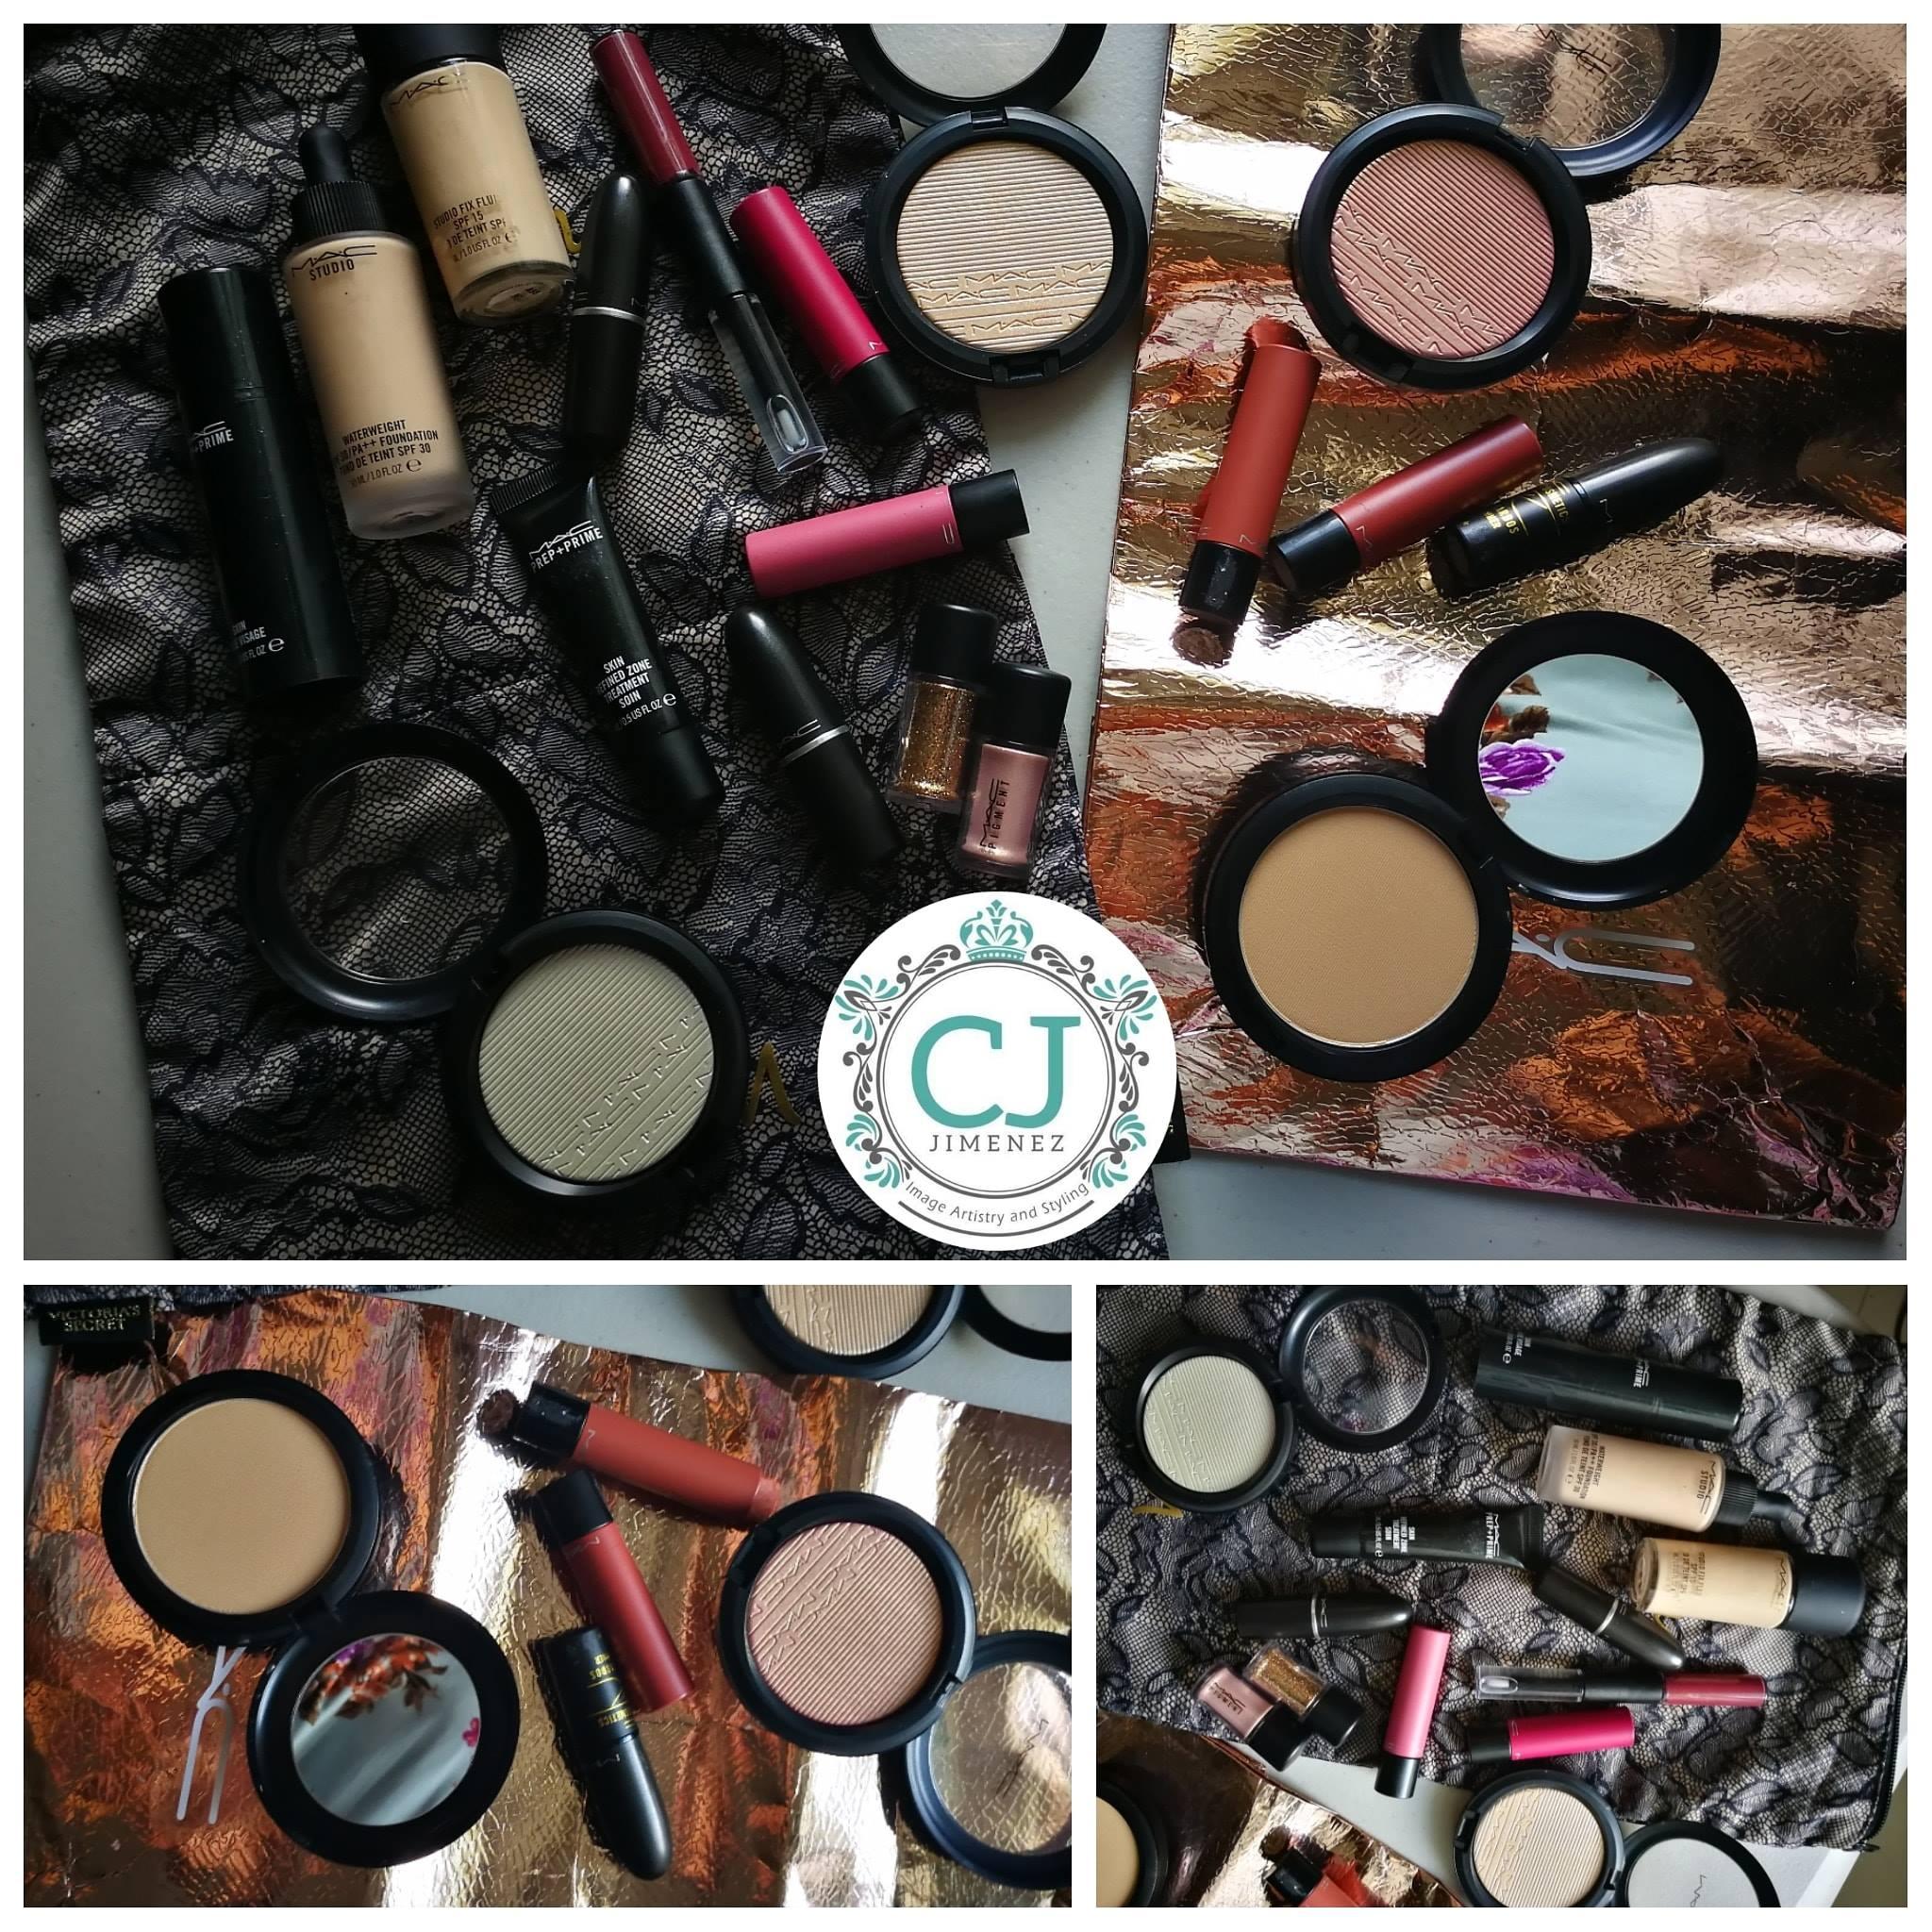 cj jimenez makeup